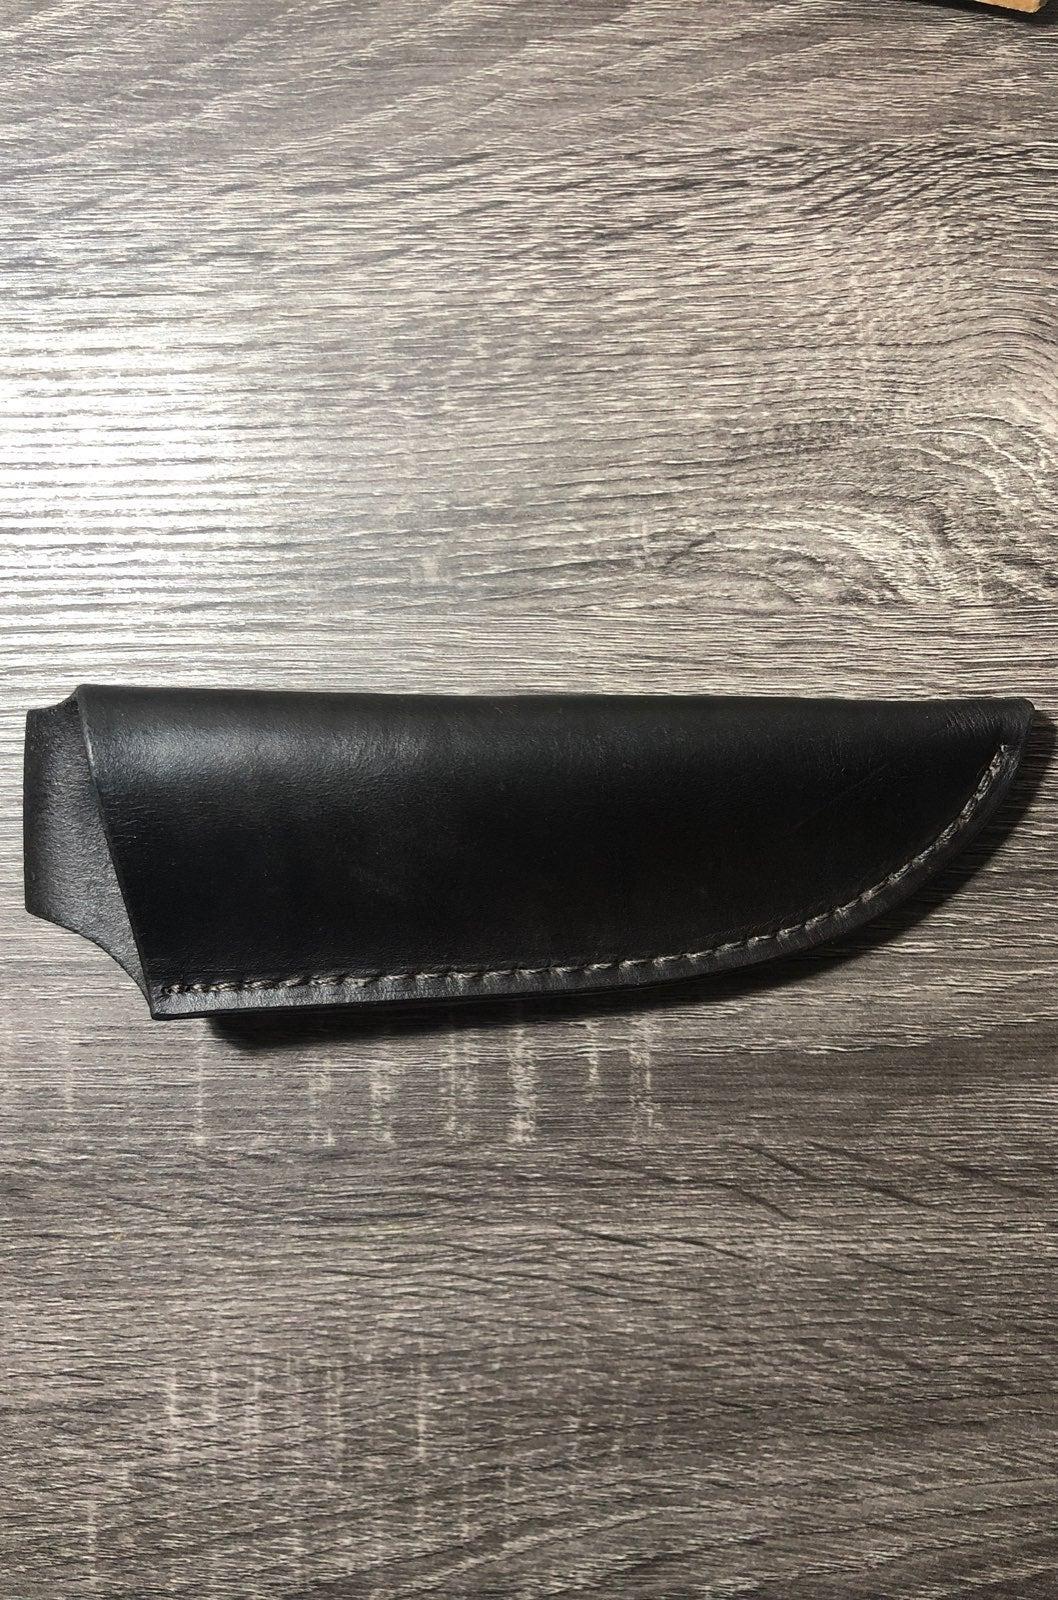 Knife Sheath (KNIFE NOT INCLUDED)